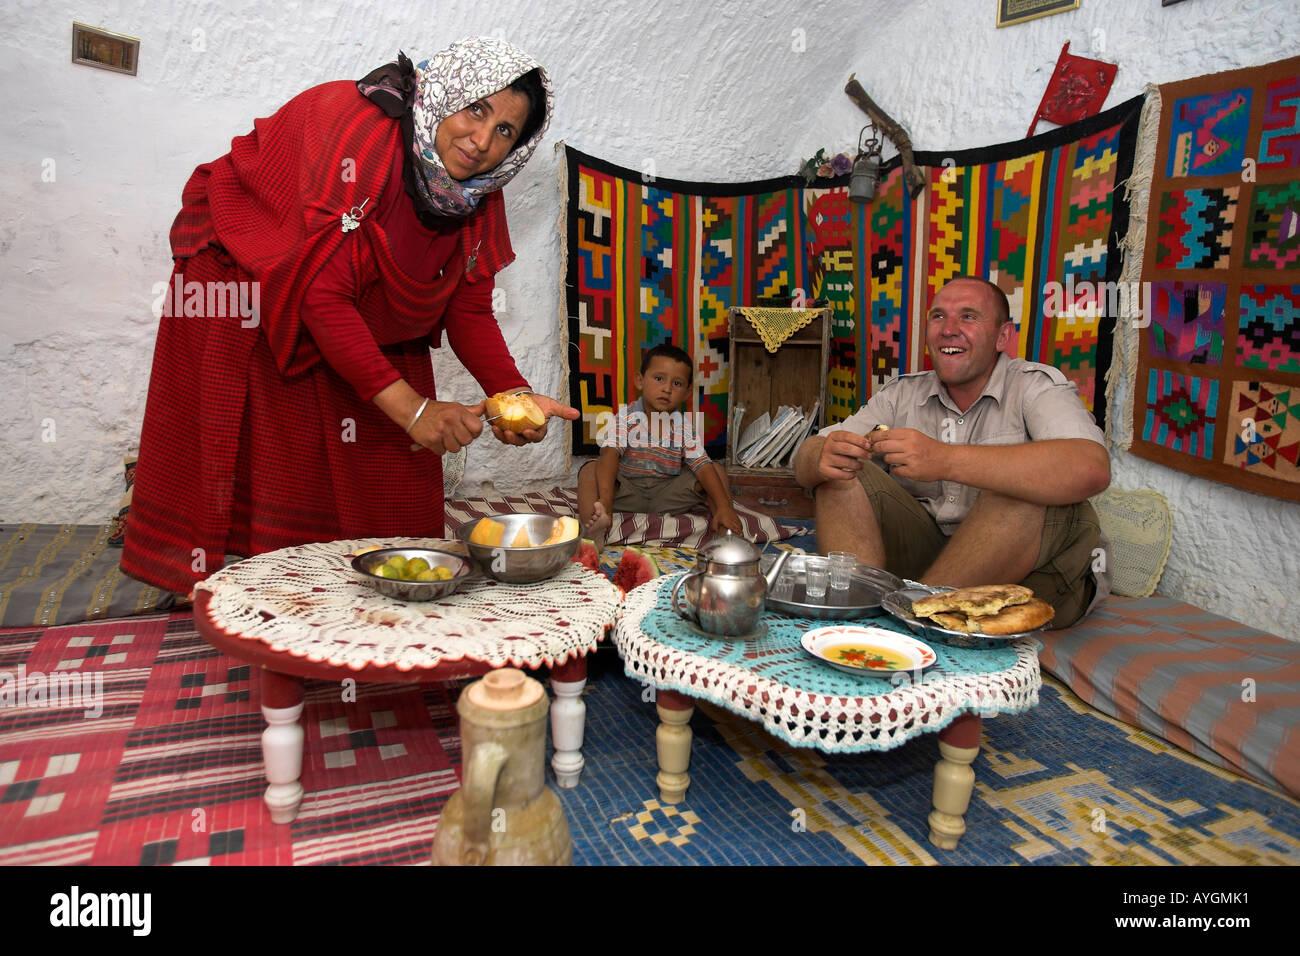 Woman entertains visitor in her underground Berber troglodyte home Matmata Tunisia Stock Photo